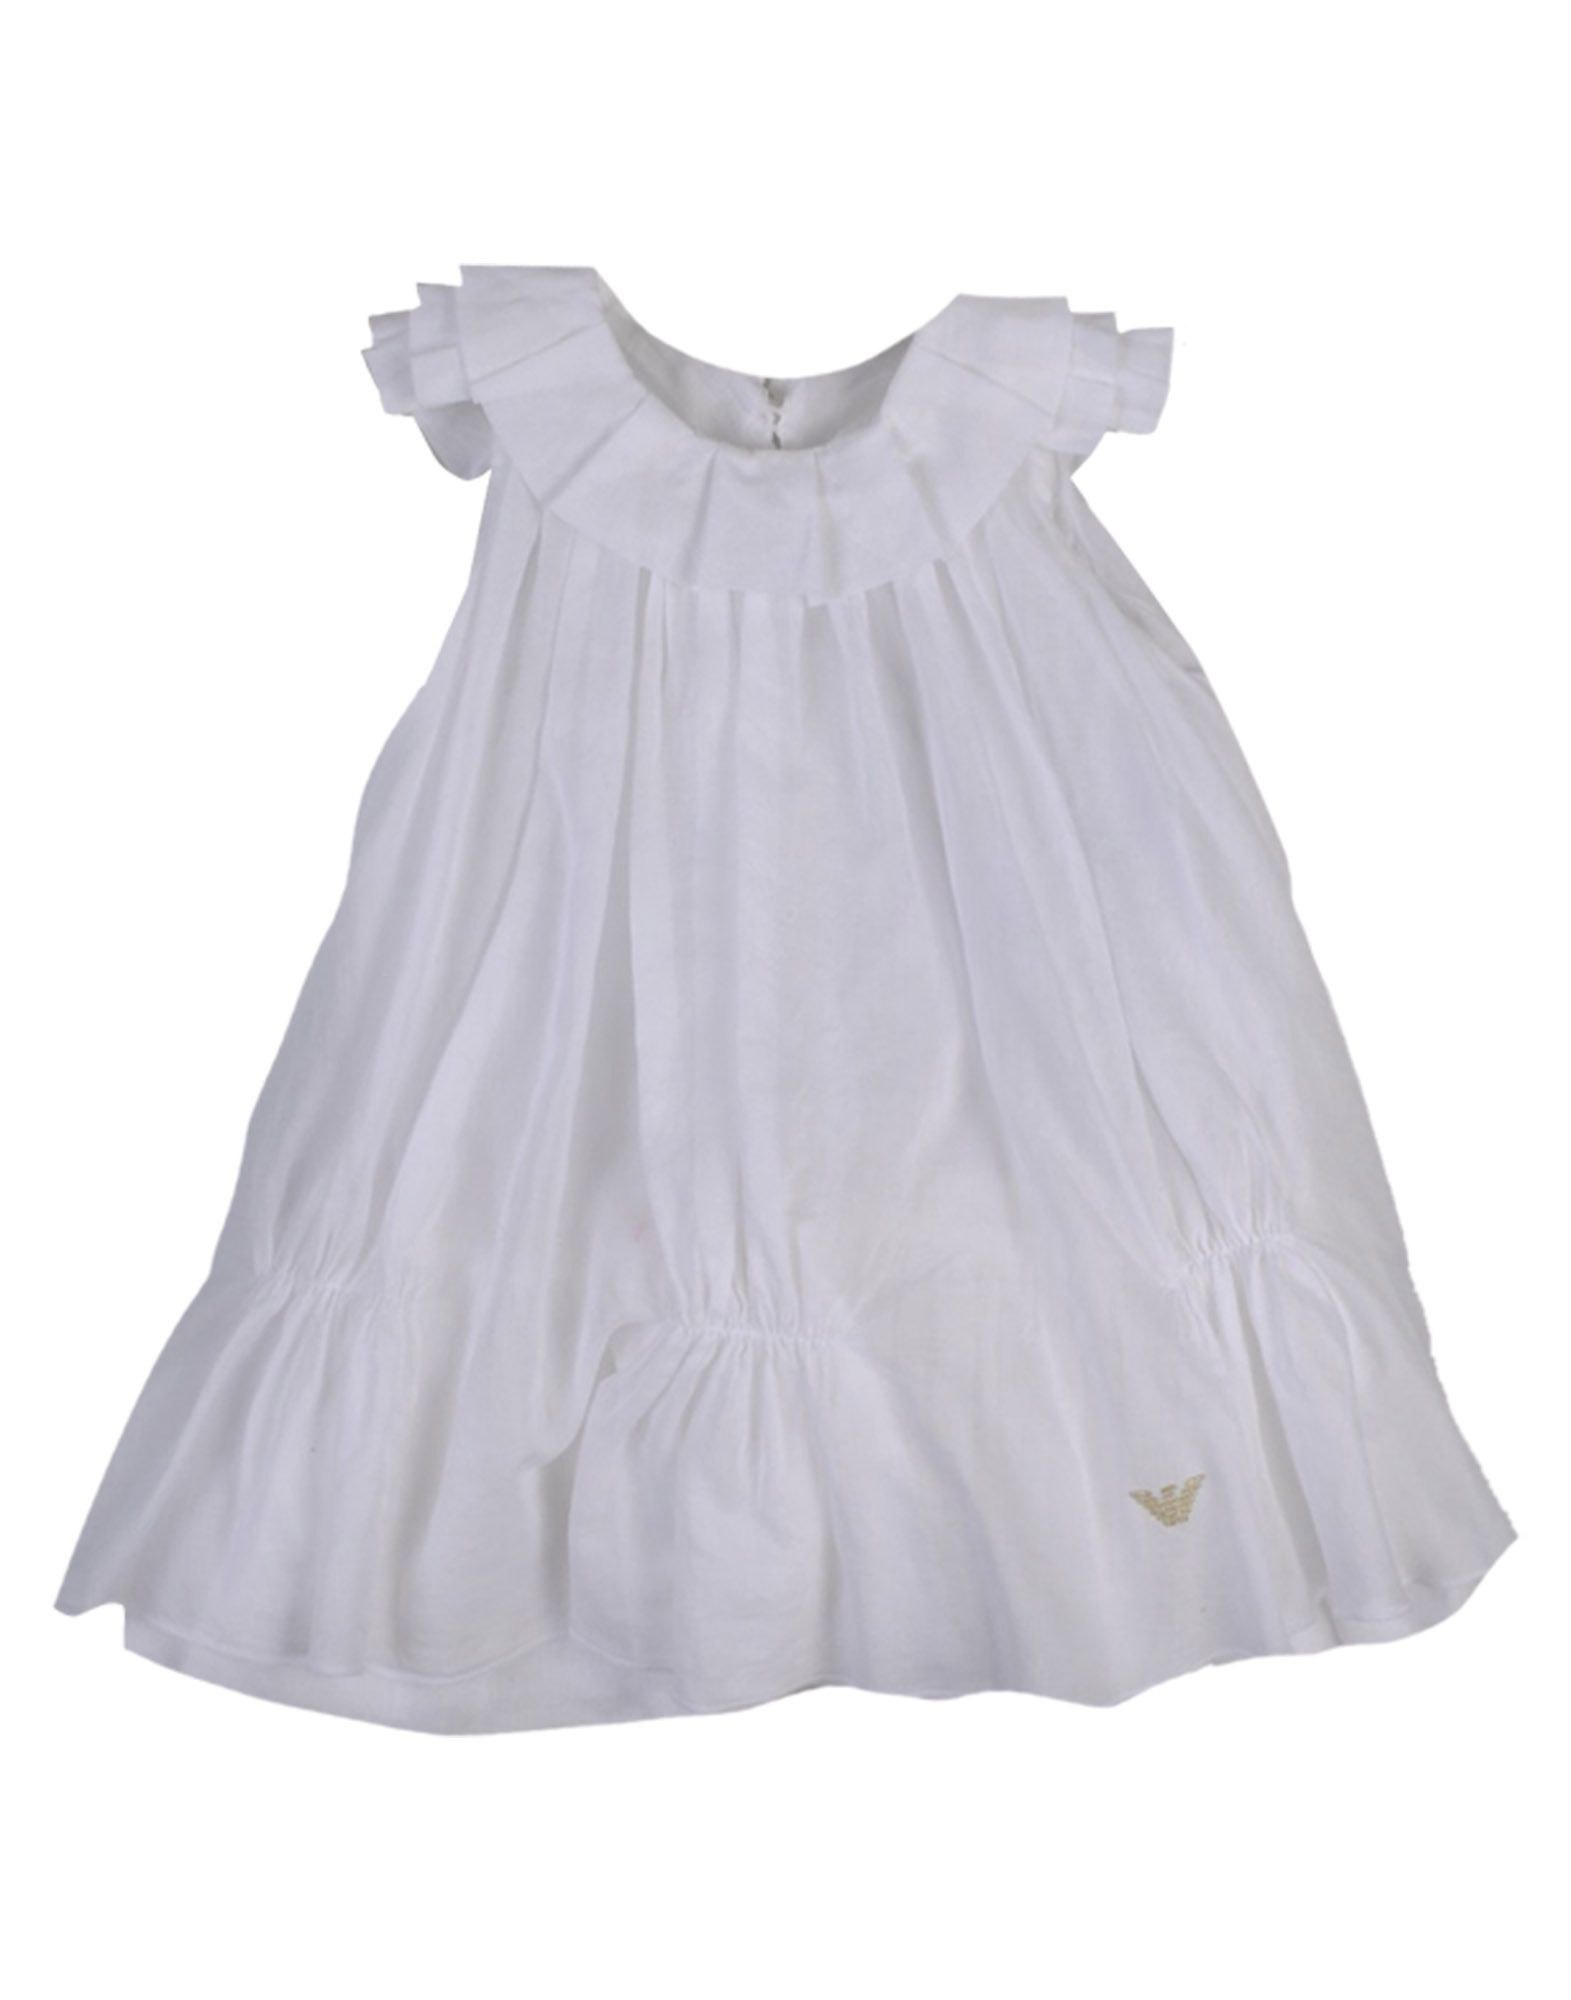 ARMANI BABY Dresses